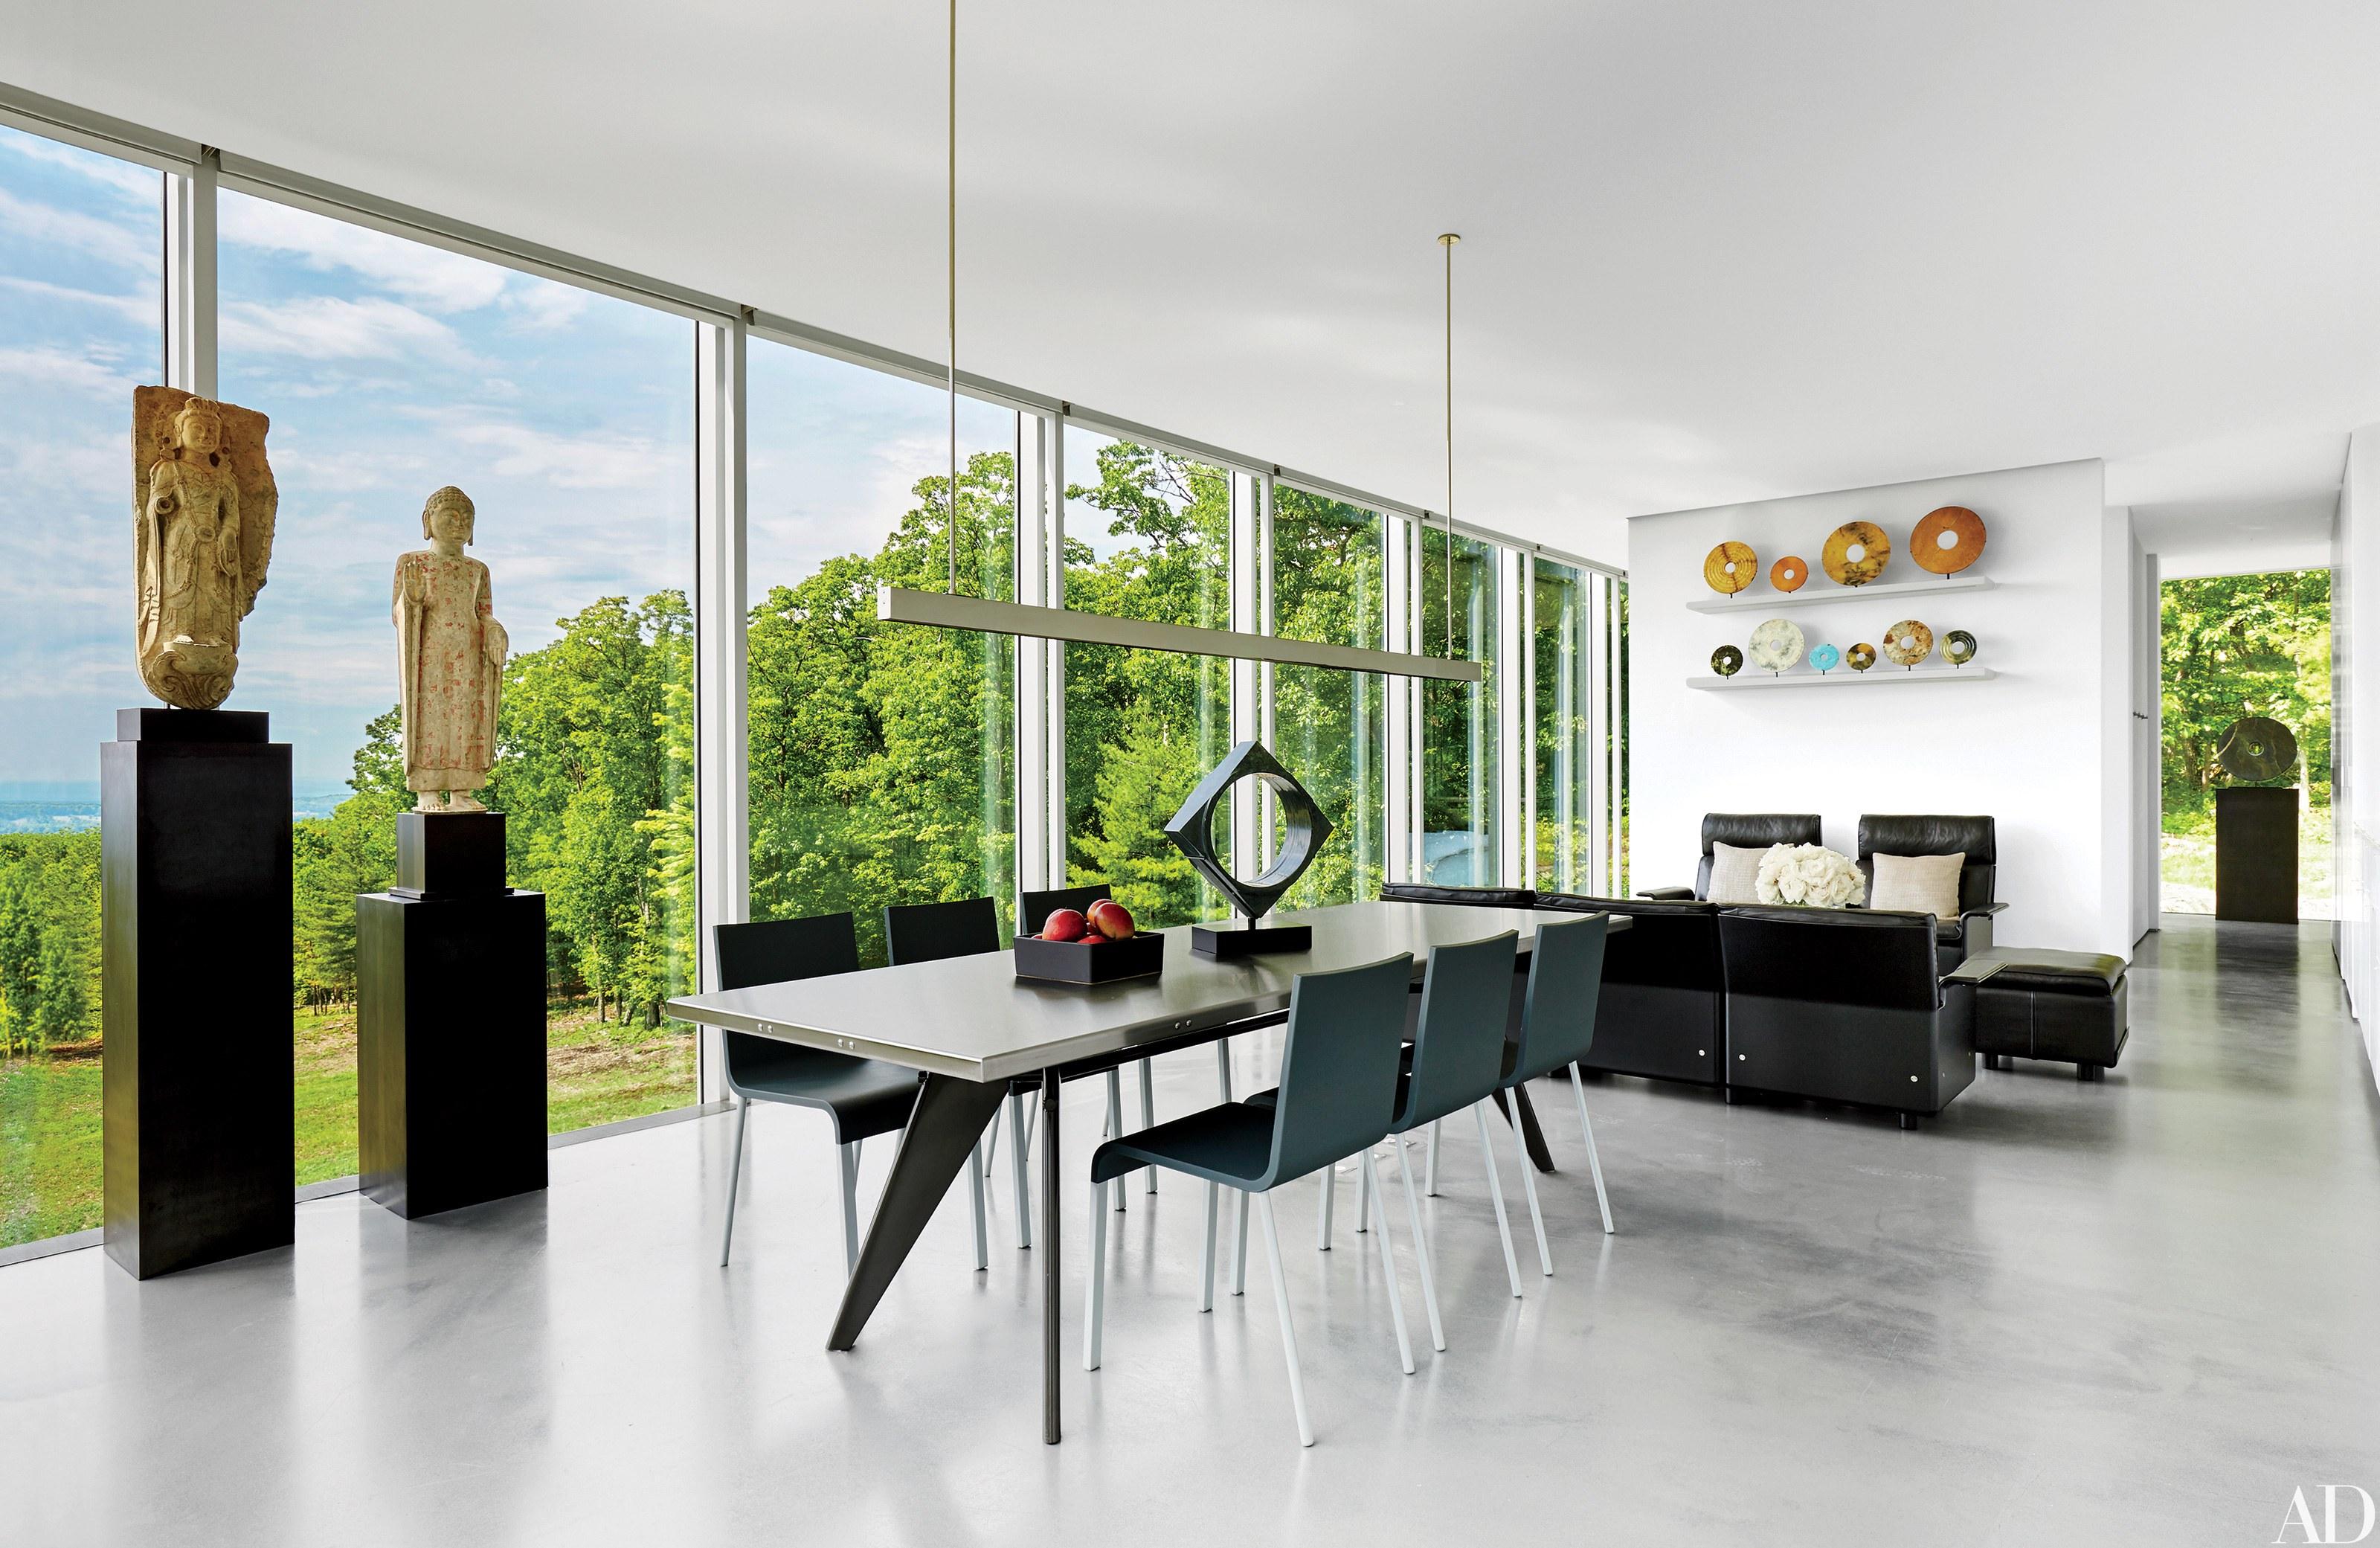 contemporary interior design 13 striking and sleek rooms rh  architecturaldigest com Architectural Charming Interior Designs  architectural